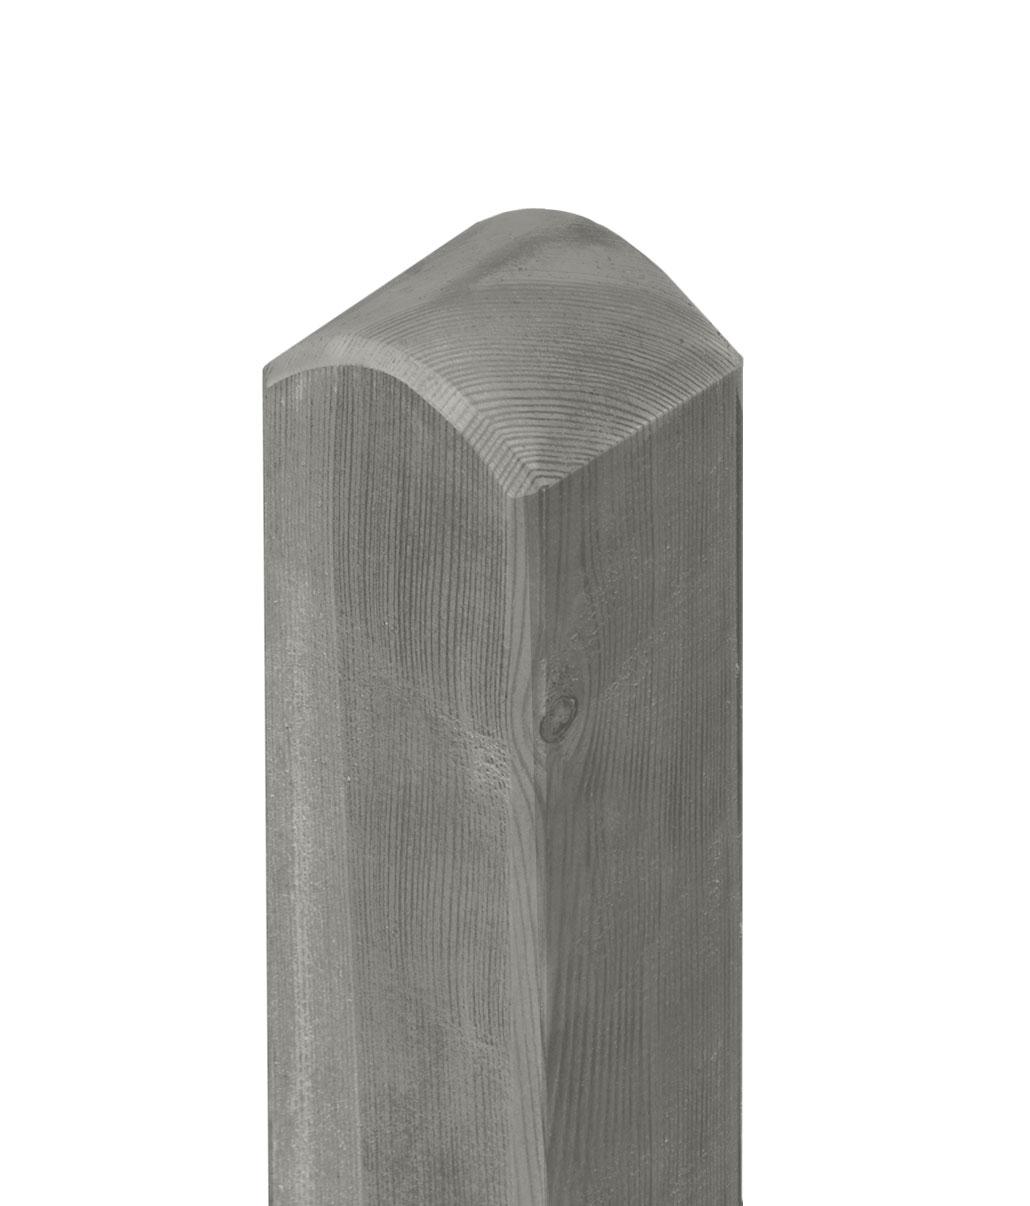 Zaunpfosten / Holzpfosten Rundkopf KI grau 9x9cm Länge 95cm Bild 1